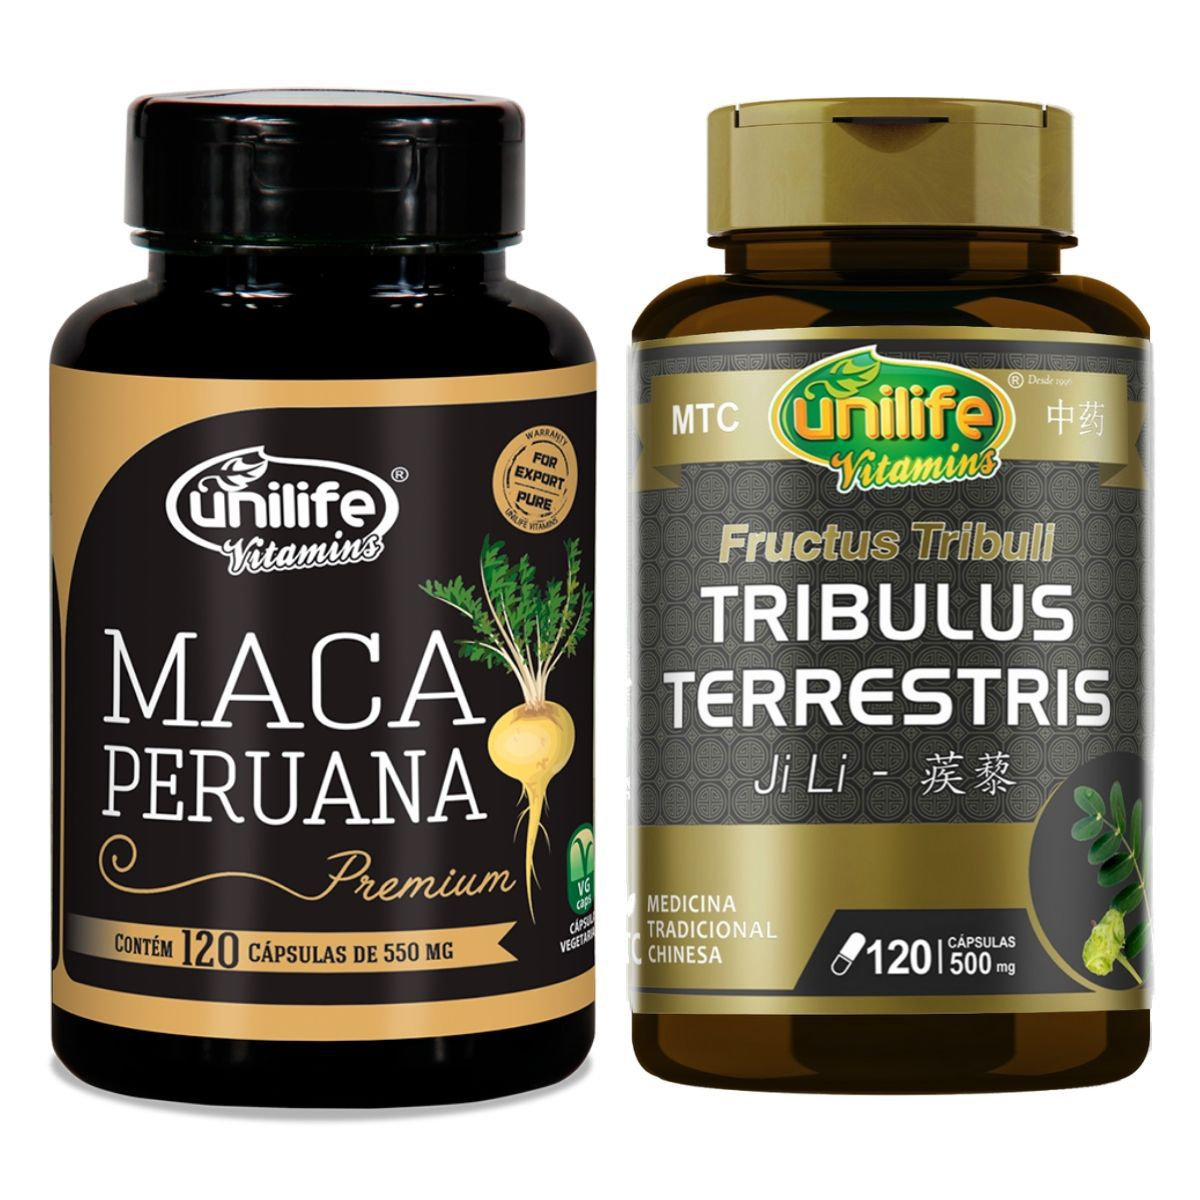 Kit Maca Peruana 550mg E Tribulus Terrestris 120 Cápsulas - Unilife